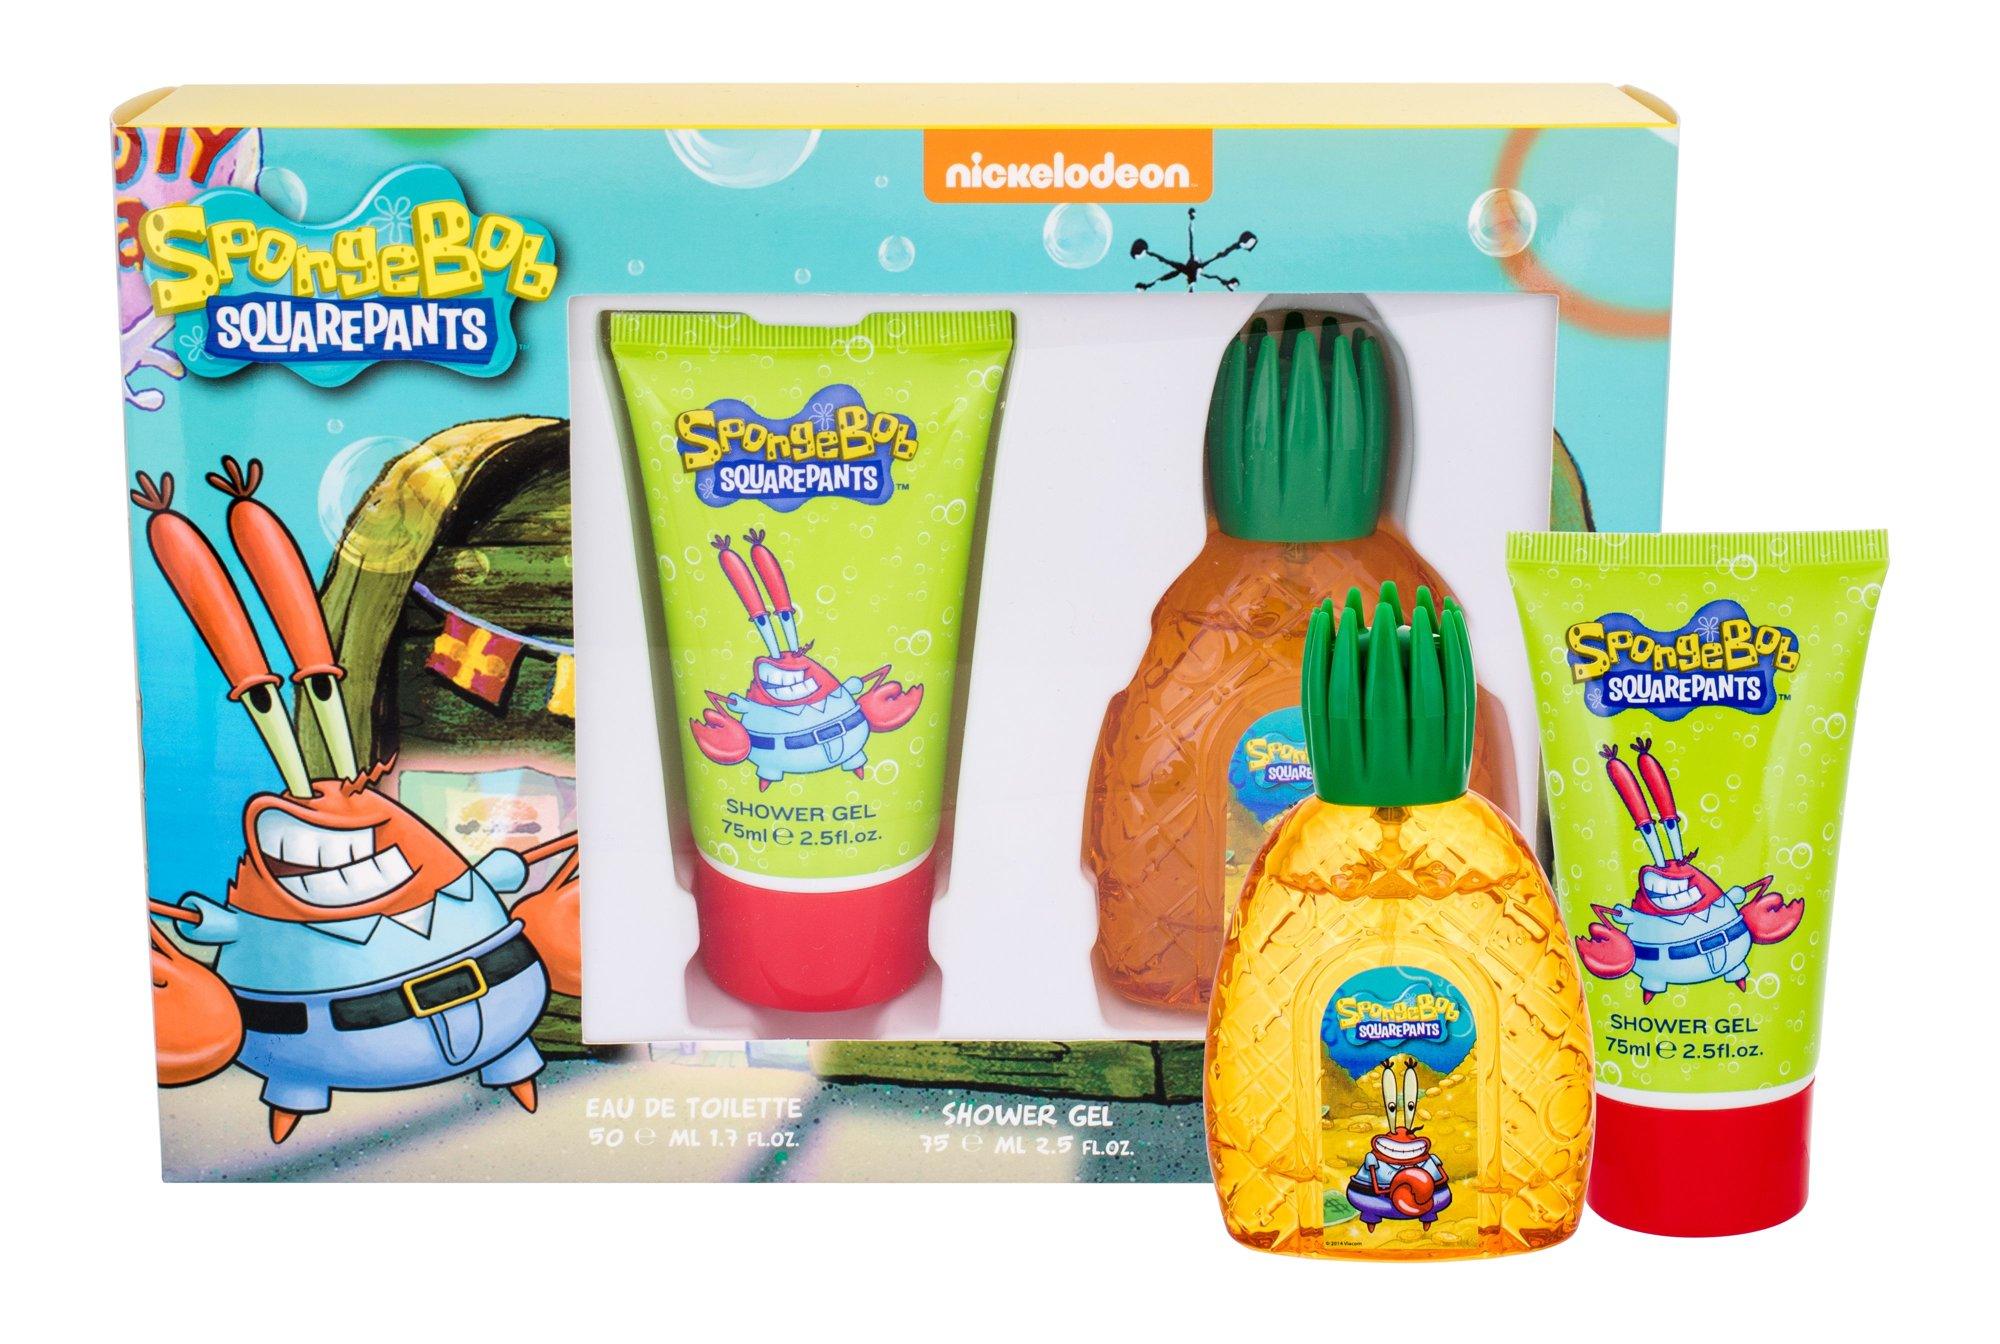 SpongeBob Squarepants Mr. Krabs EDT 50ml